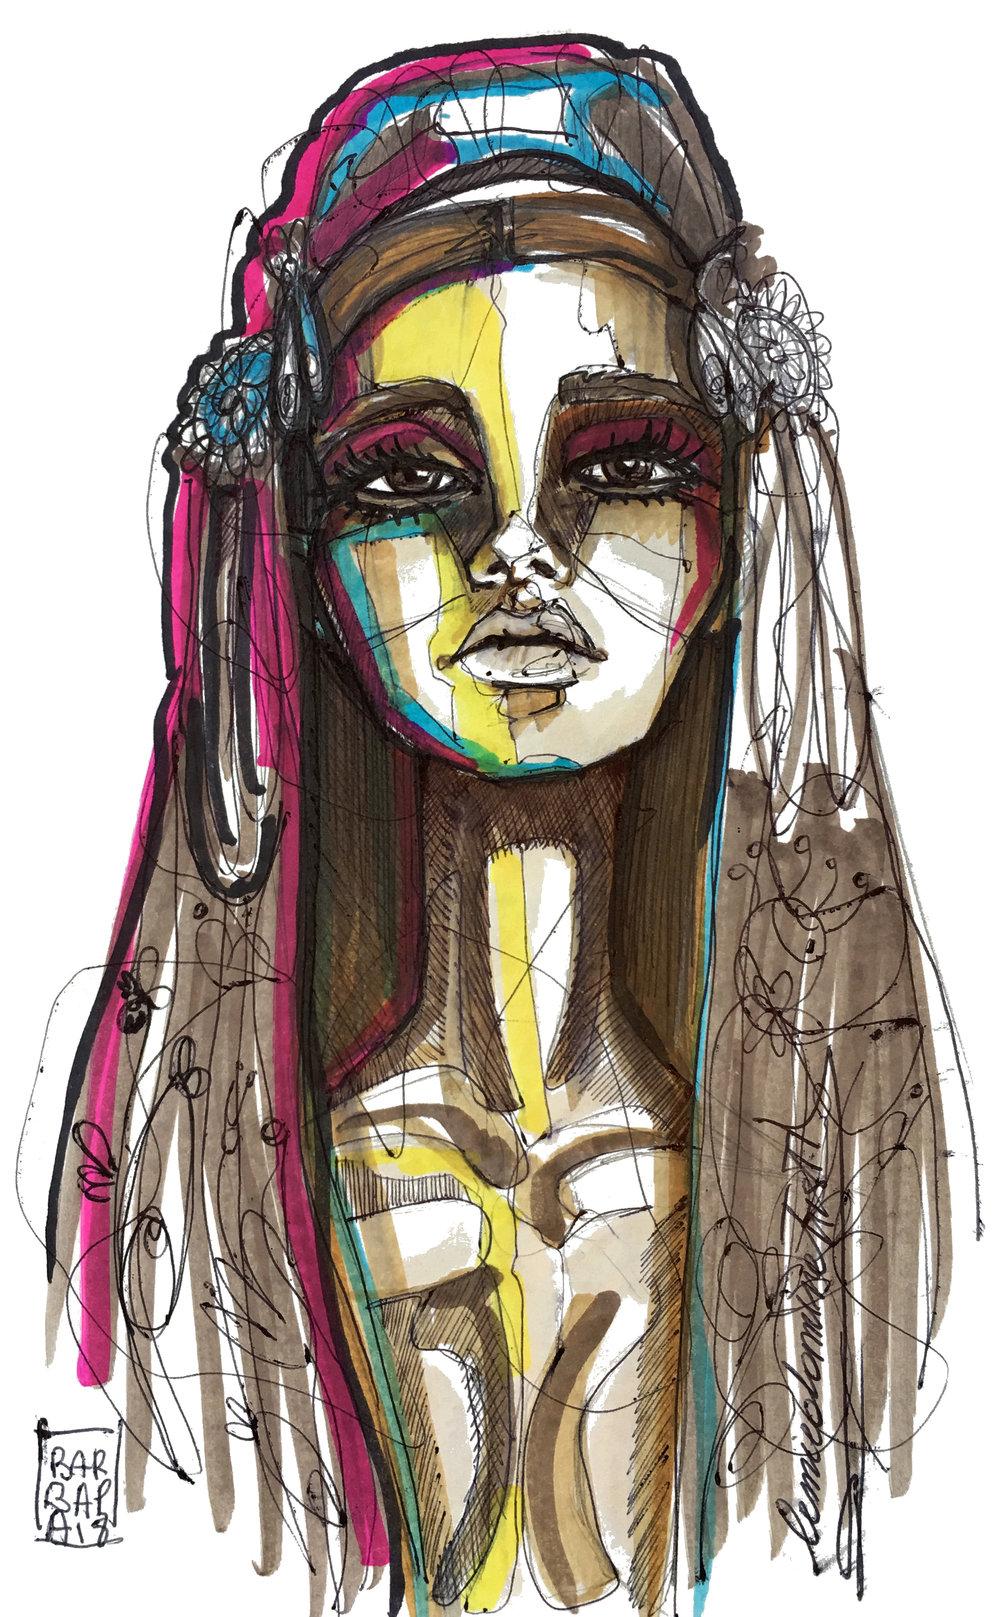 sardinian woman - Pantone and pen on paper.